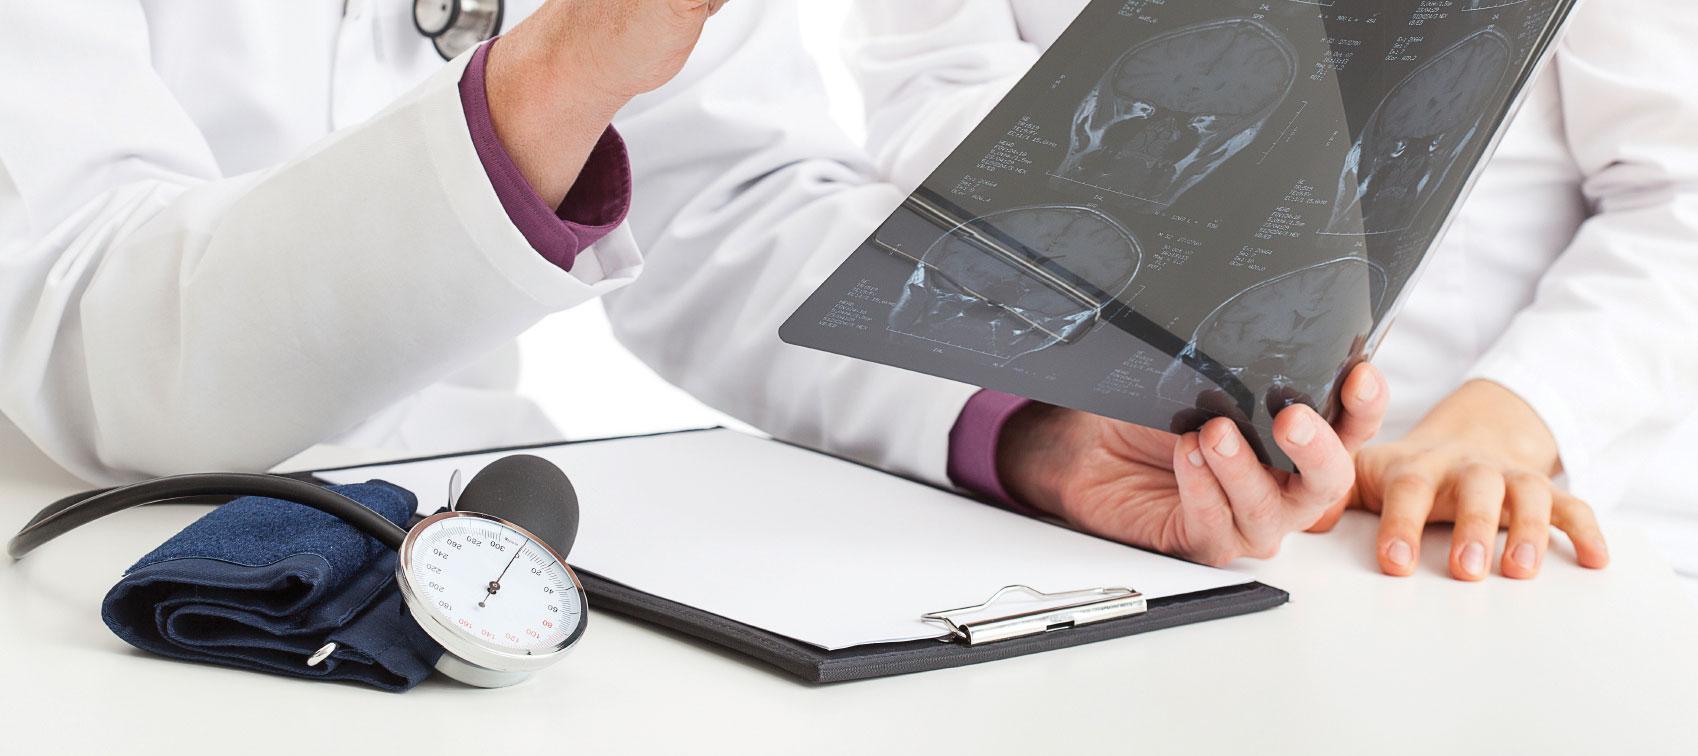 Physicians examining and X-Ray